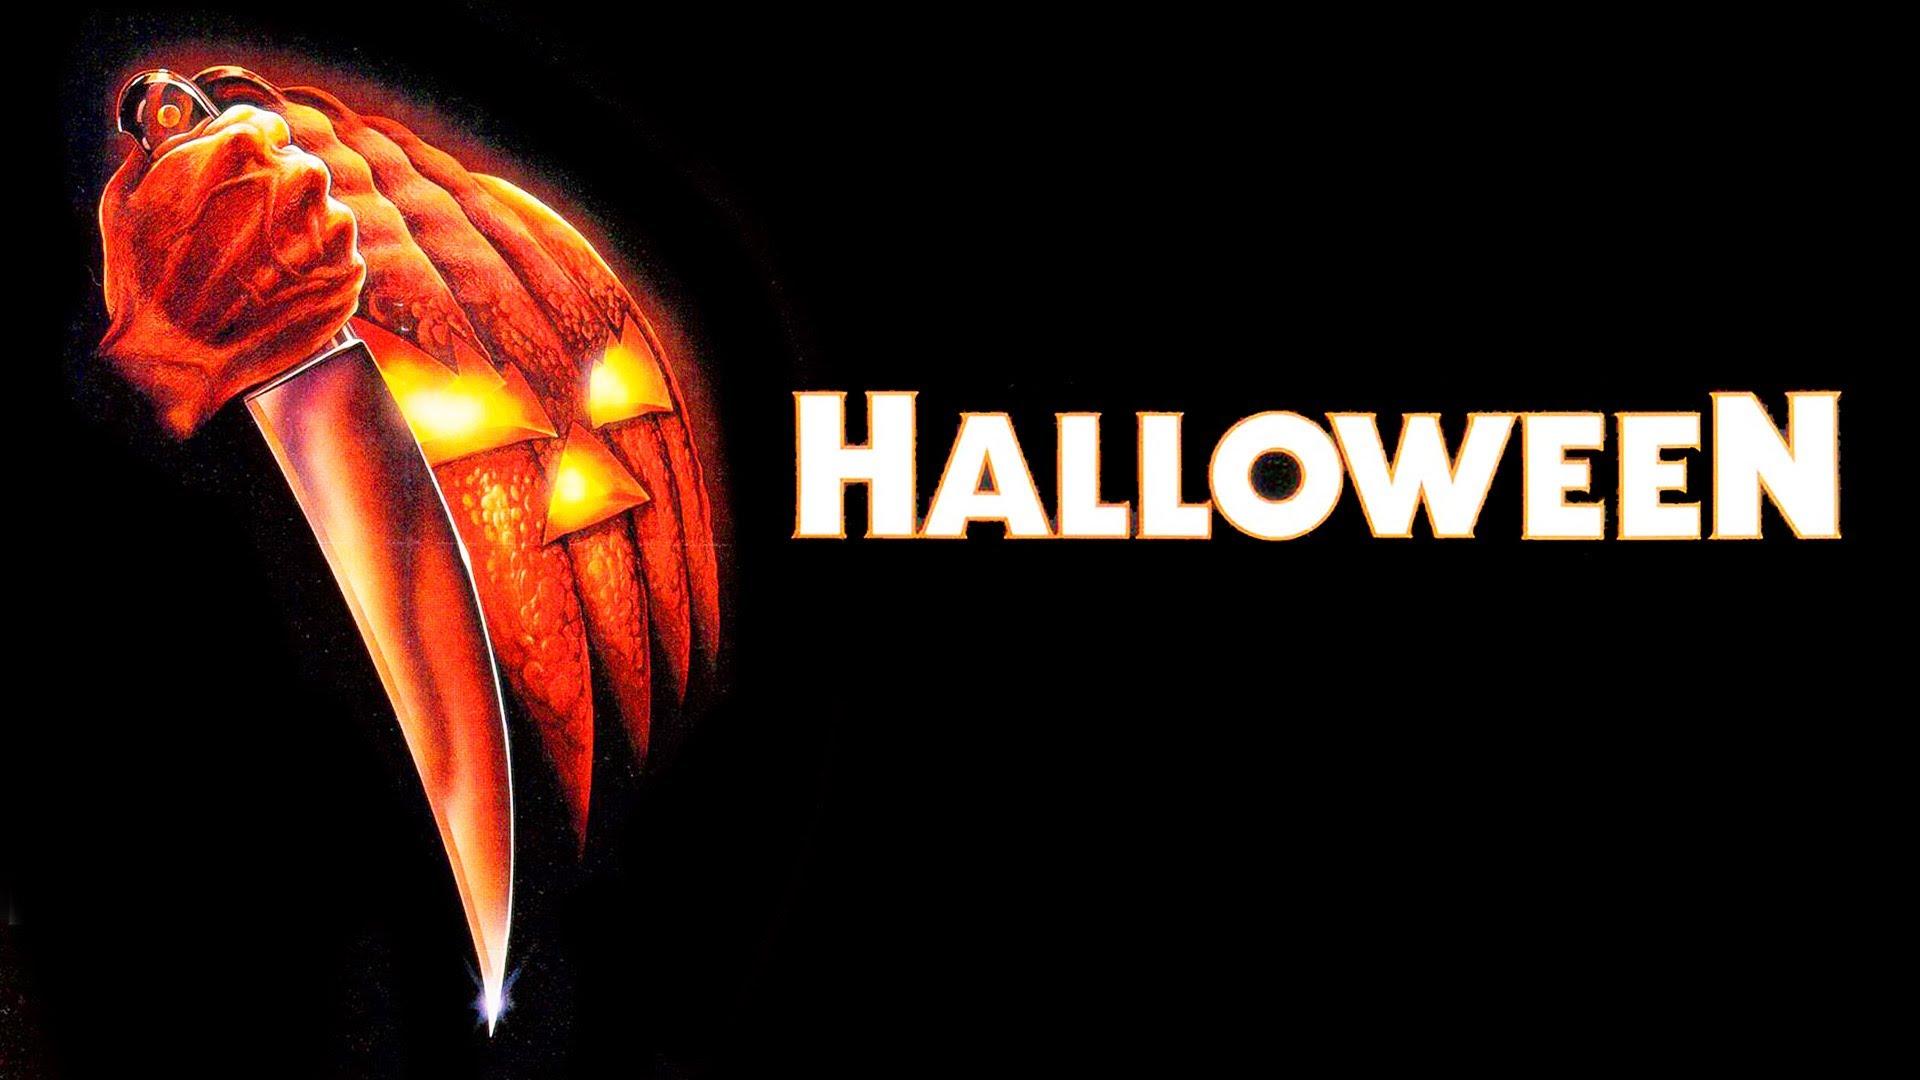 the 30 best horror movie soundtracks of all time « taste of cinema